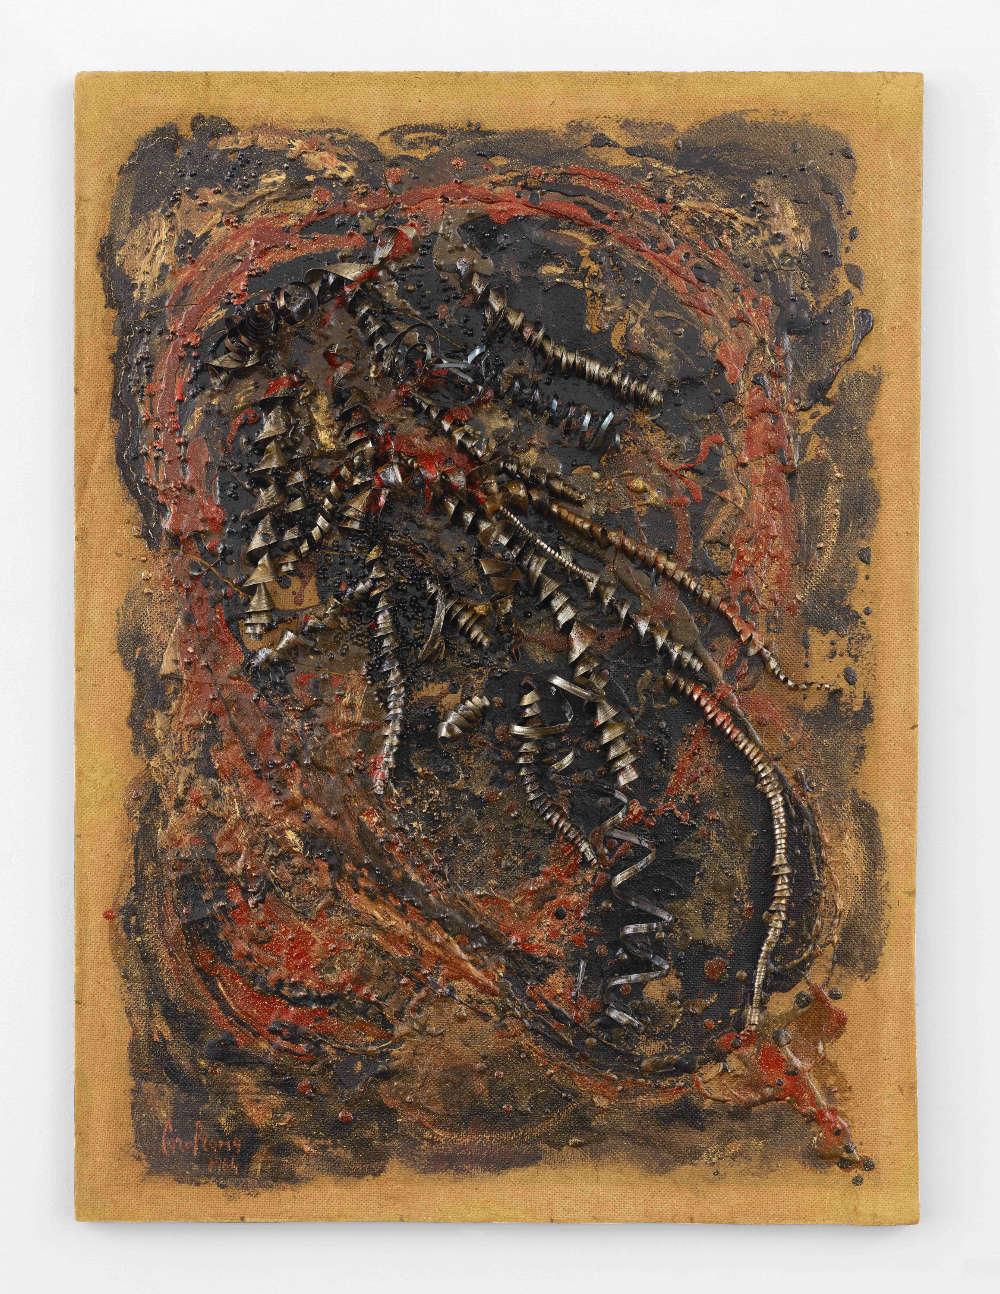 CAROL RAMA, Bricolage, 1964. Oil, lacquer, beads, and metal shavings on Masonite 27 x 20 inches (69 x 51 cm) © Archivio Carol Rama, Torino. Photo: Elisabeth Bernstein. Courtesy Lévy Gorvy